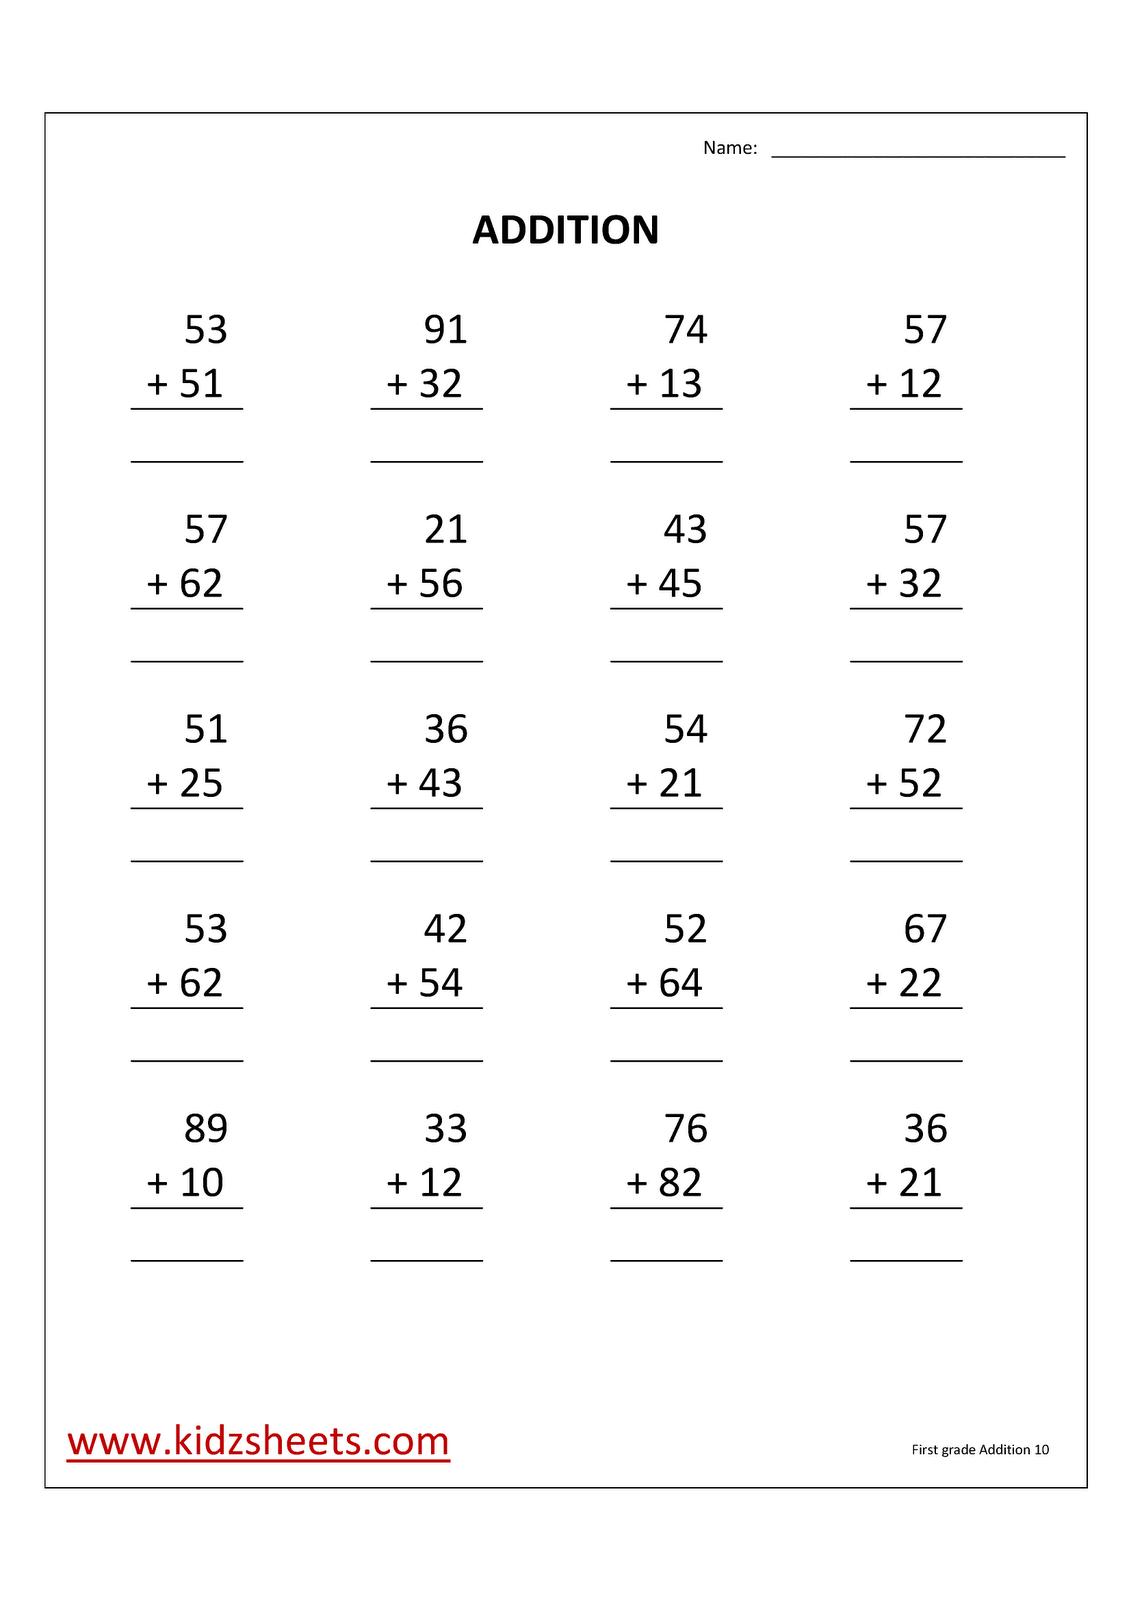 medium resolution of Kidz Worksheets: First Grade Addition Worksheet10